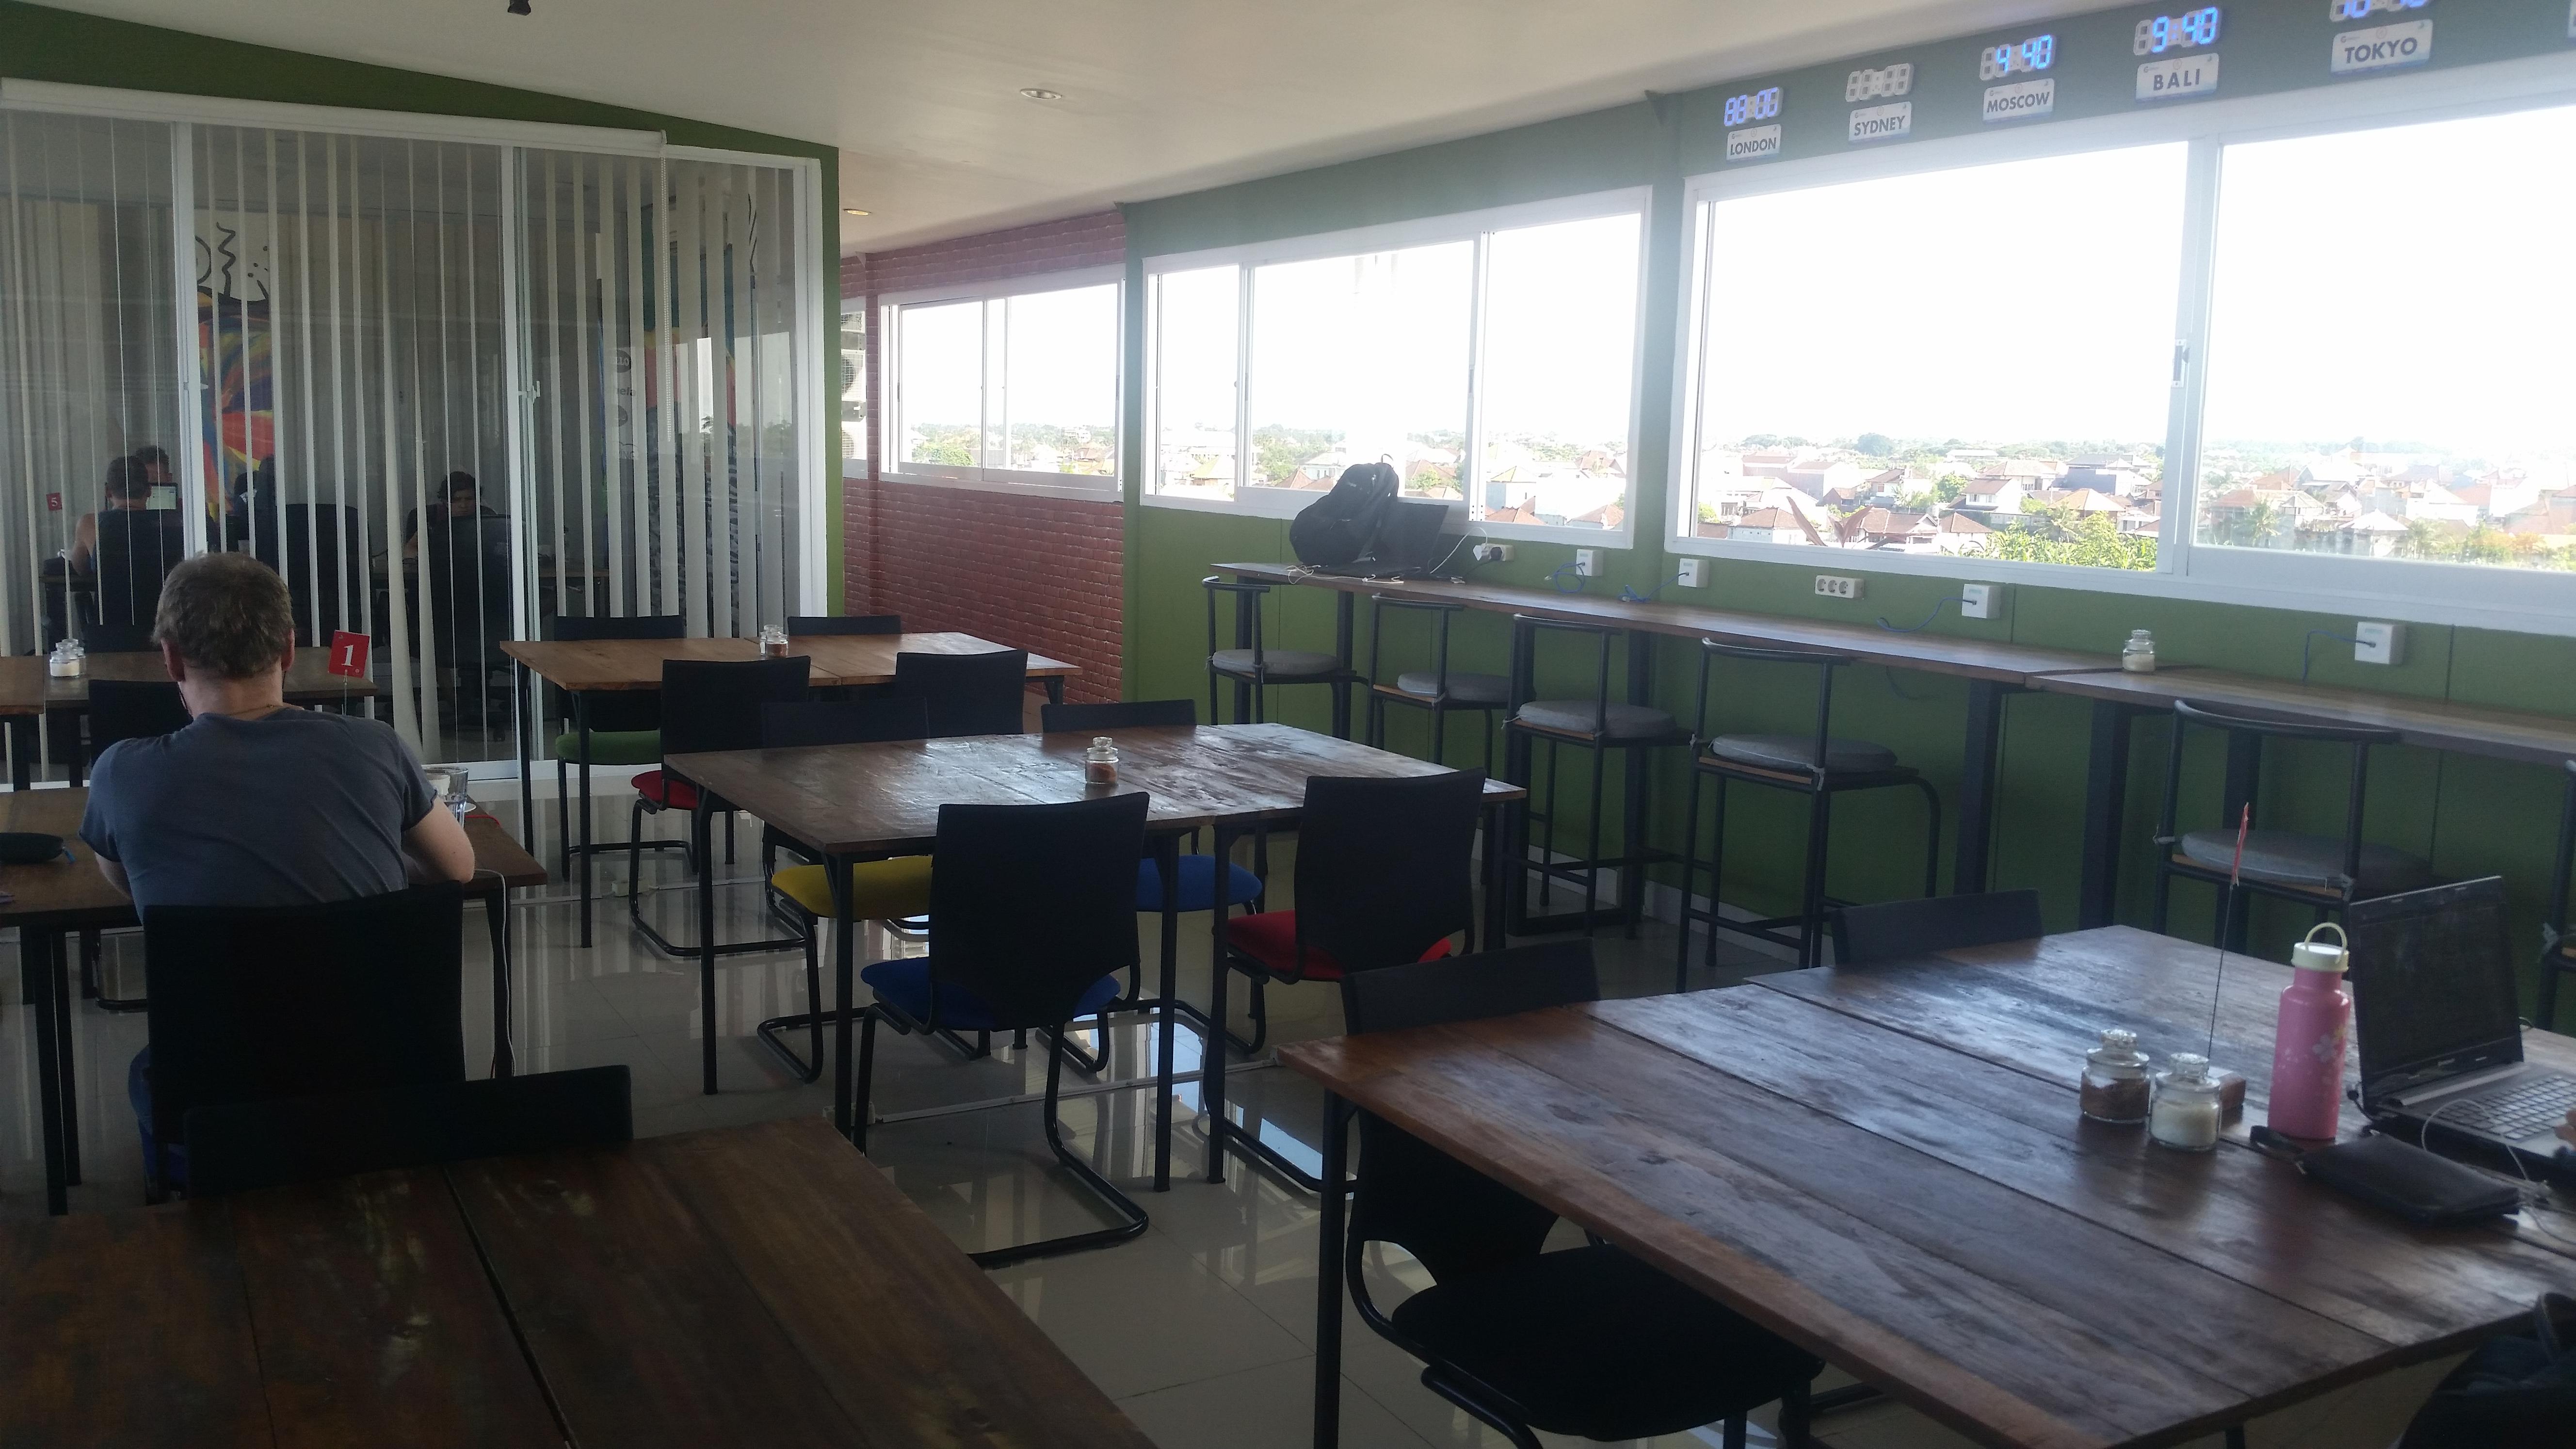 The main room in Matra Co-working Space, Canggu.